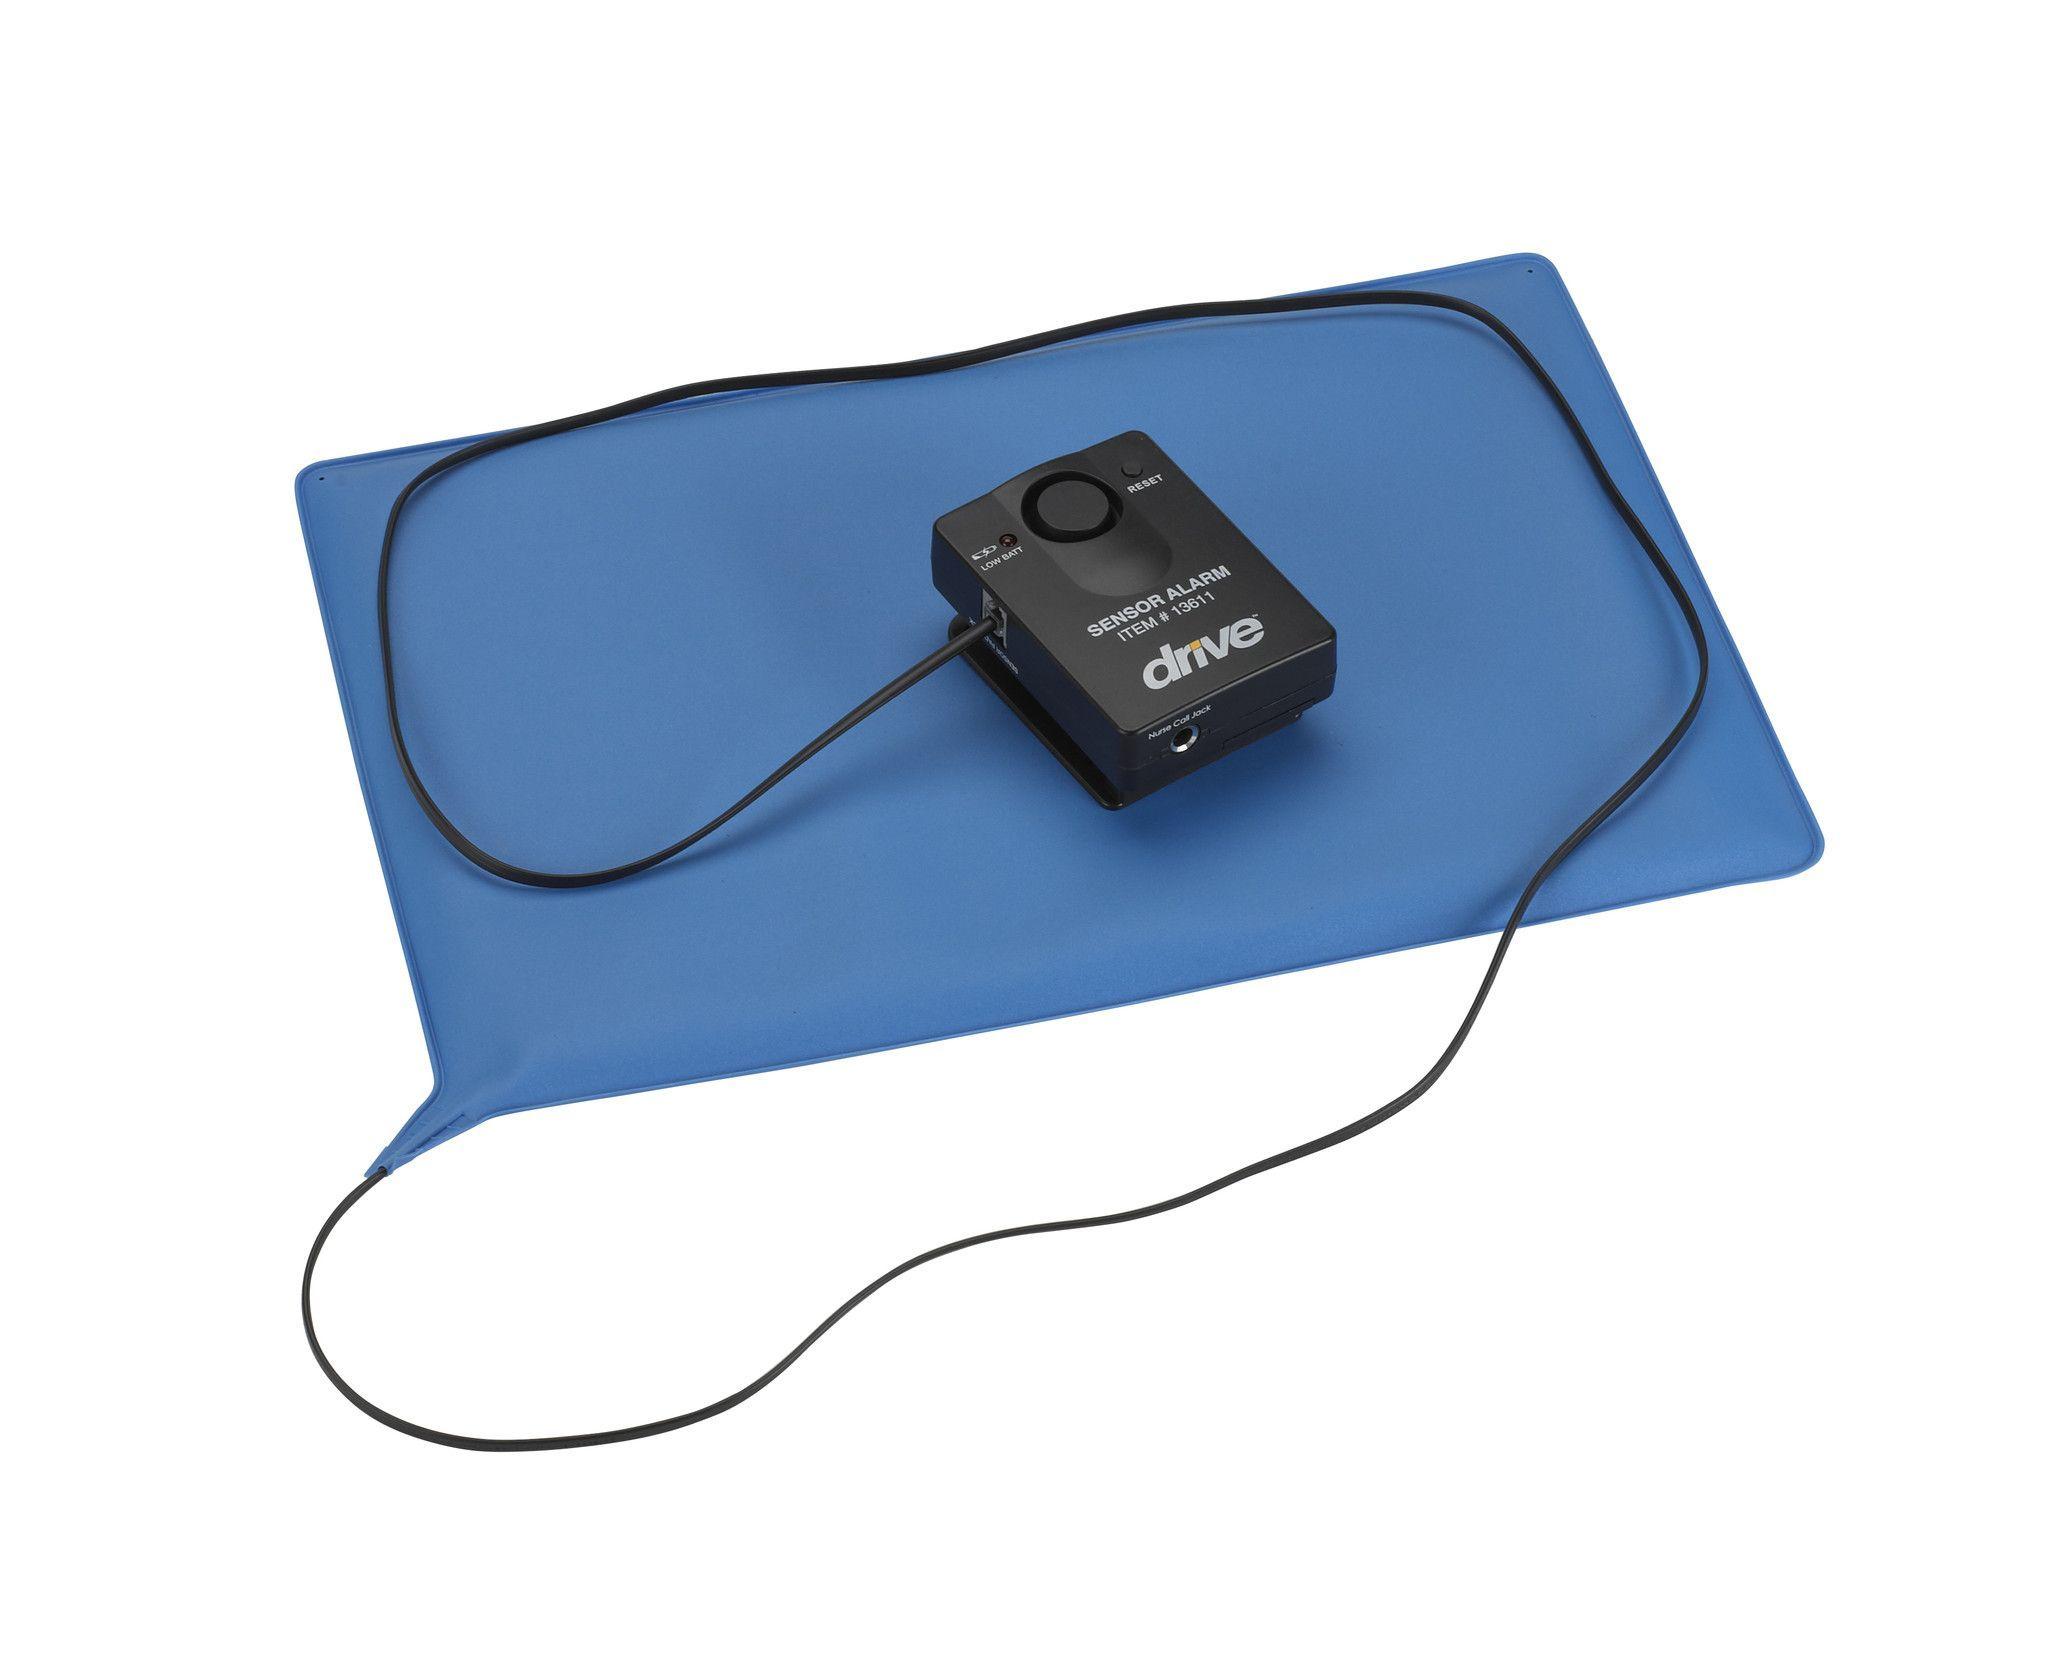 Pressure Sensitive Bed Chair Patient Alarm with Reset